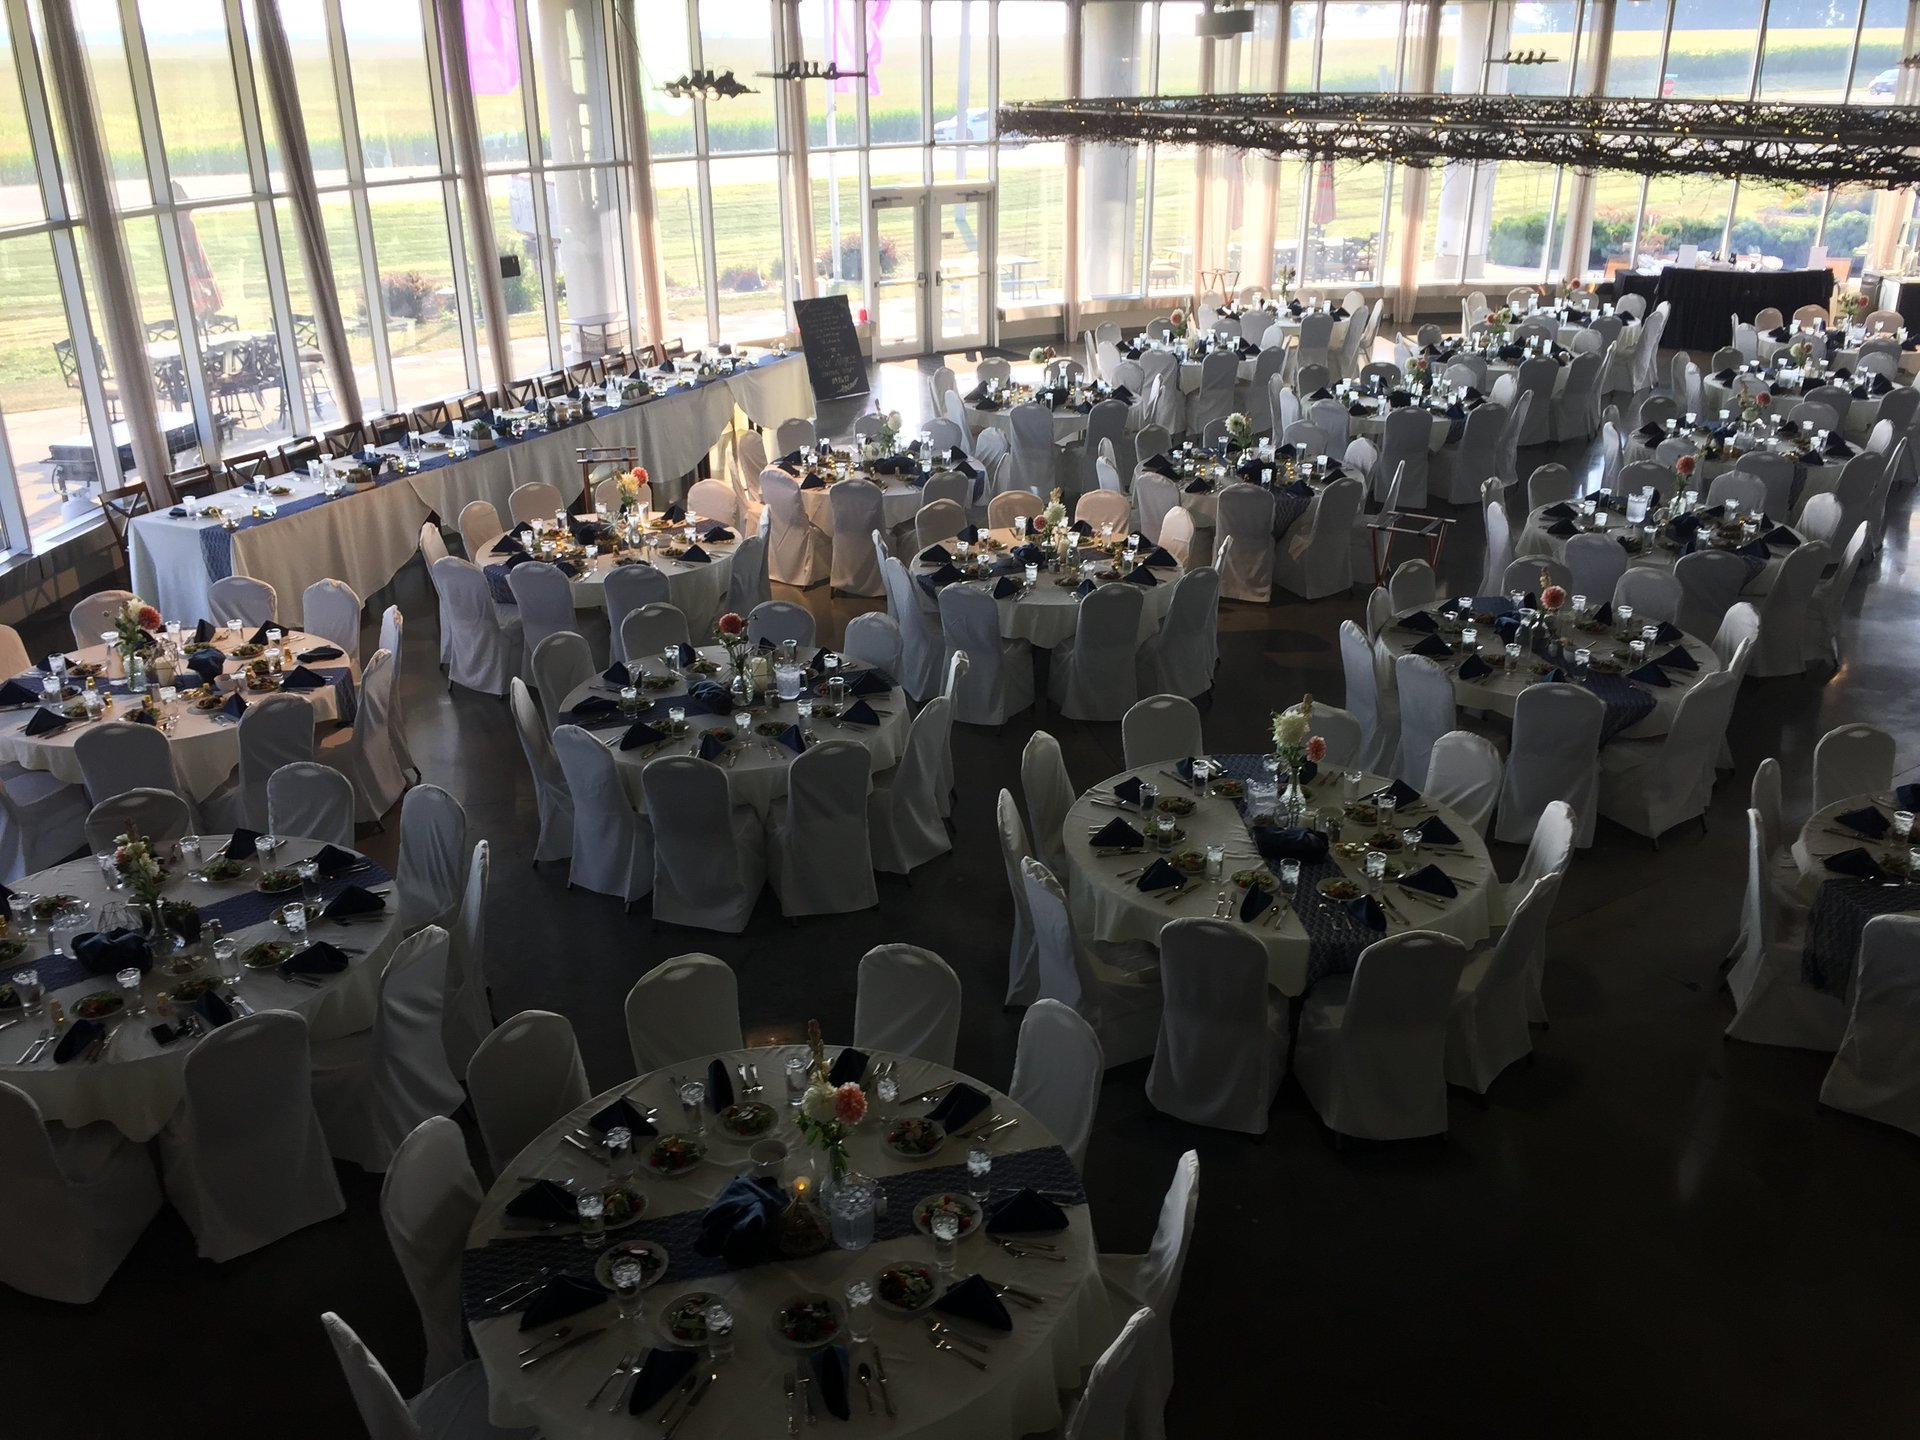 Cambridge Winery Award Winning Wine Gorgeous Event Center